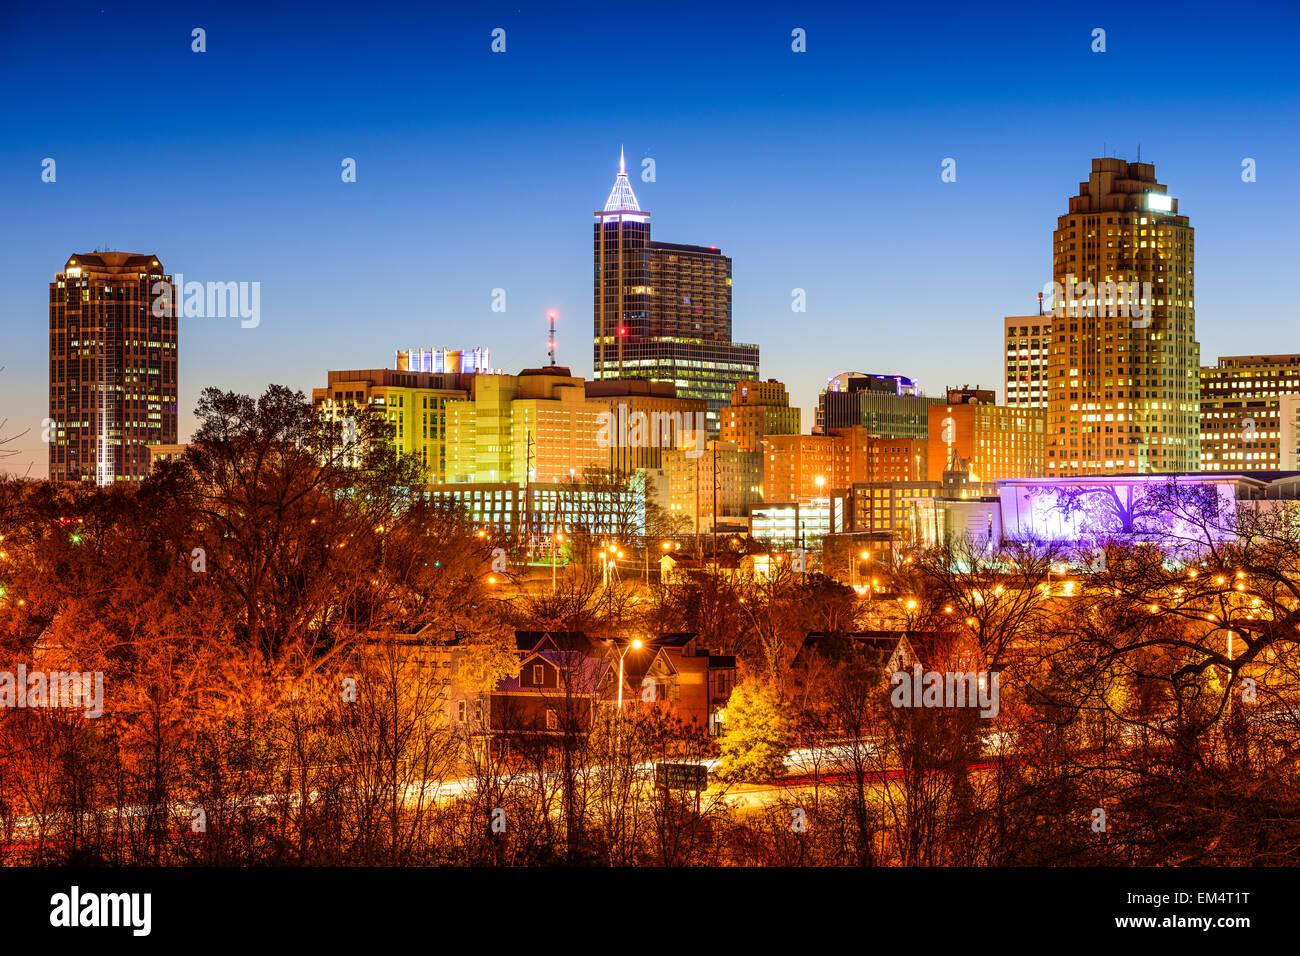 Raleigh, Carolina del Norte, EE.UU. horizonte. Imagen De Stock